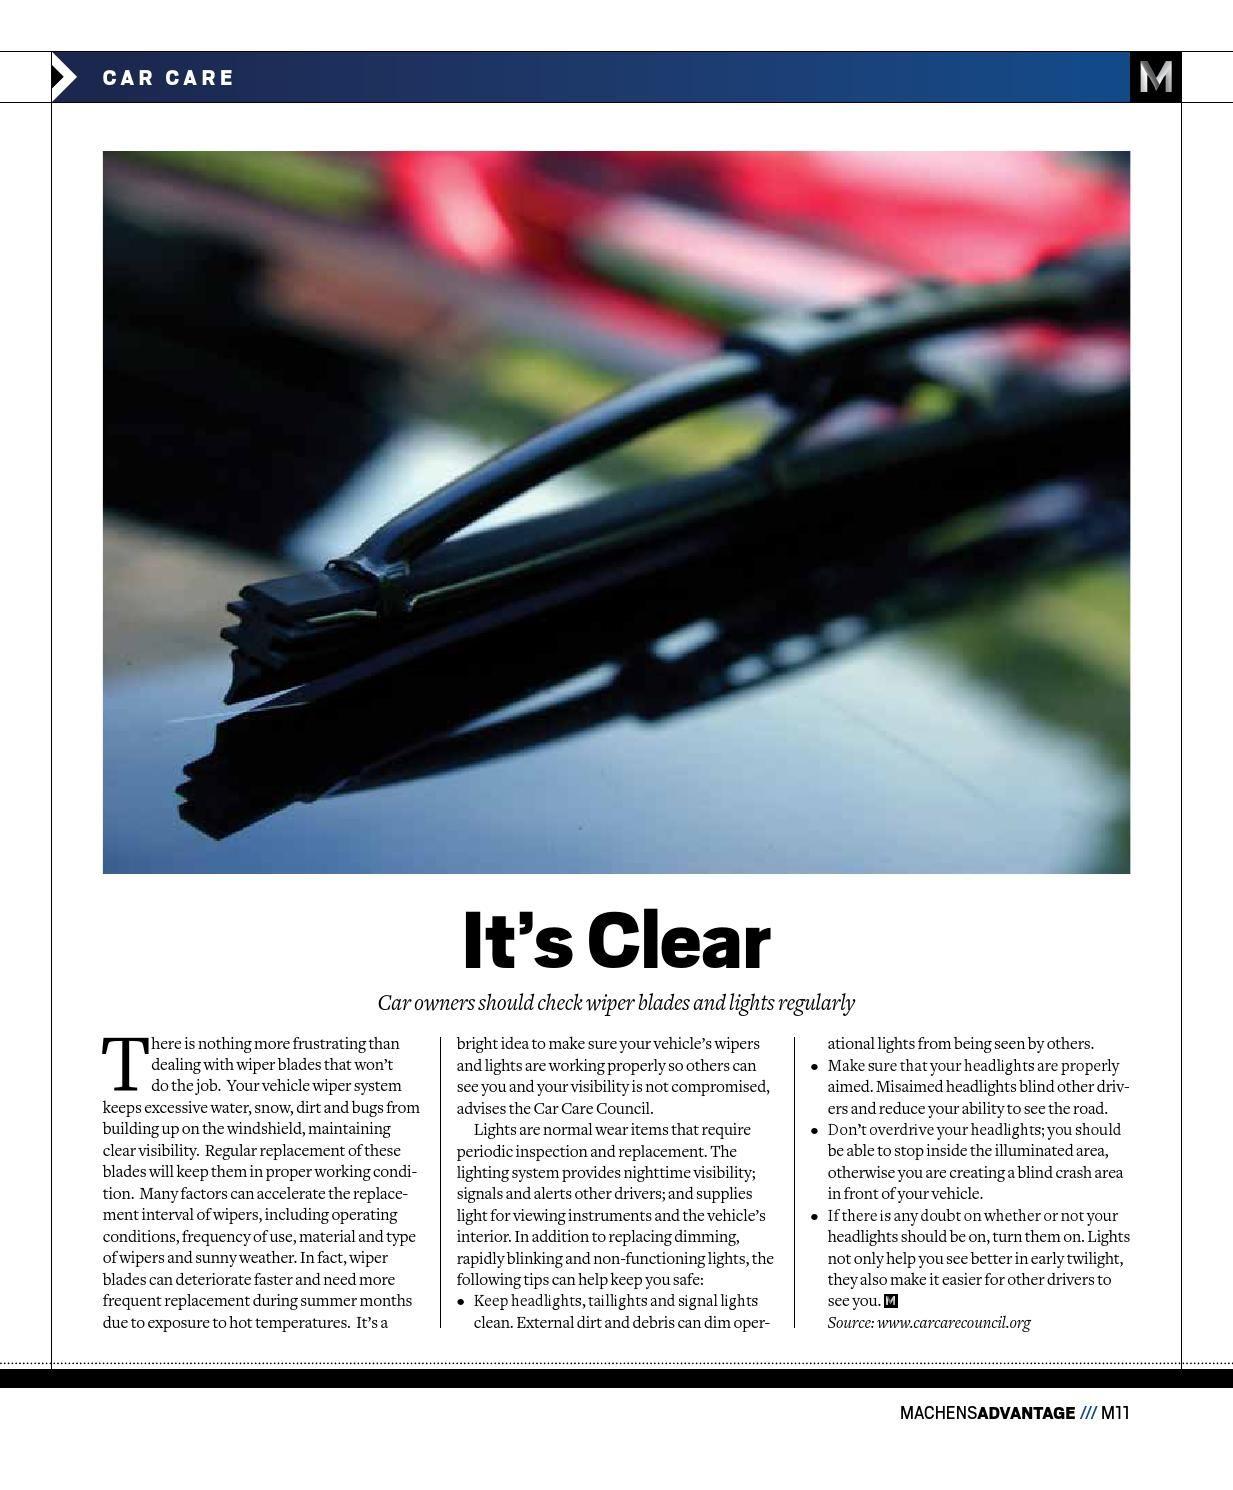 Car Dealerships In Columbia Mo >> July Machens Advantage | 2015 hyundai genesis, Car ...